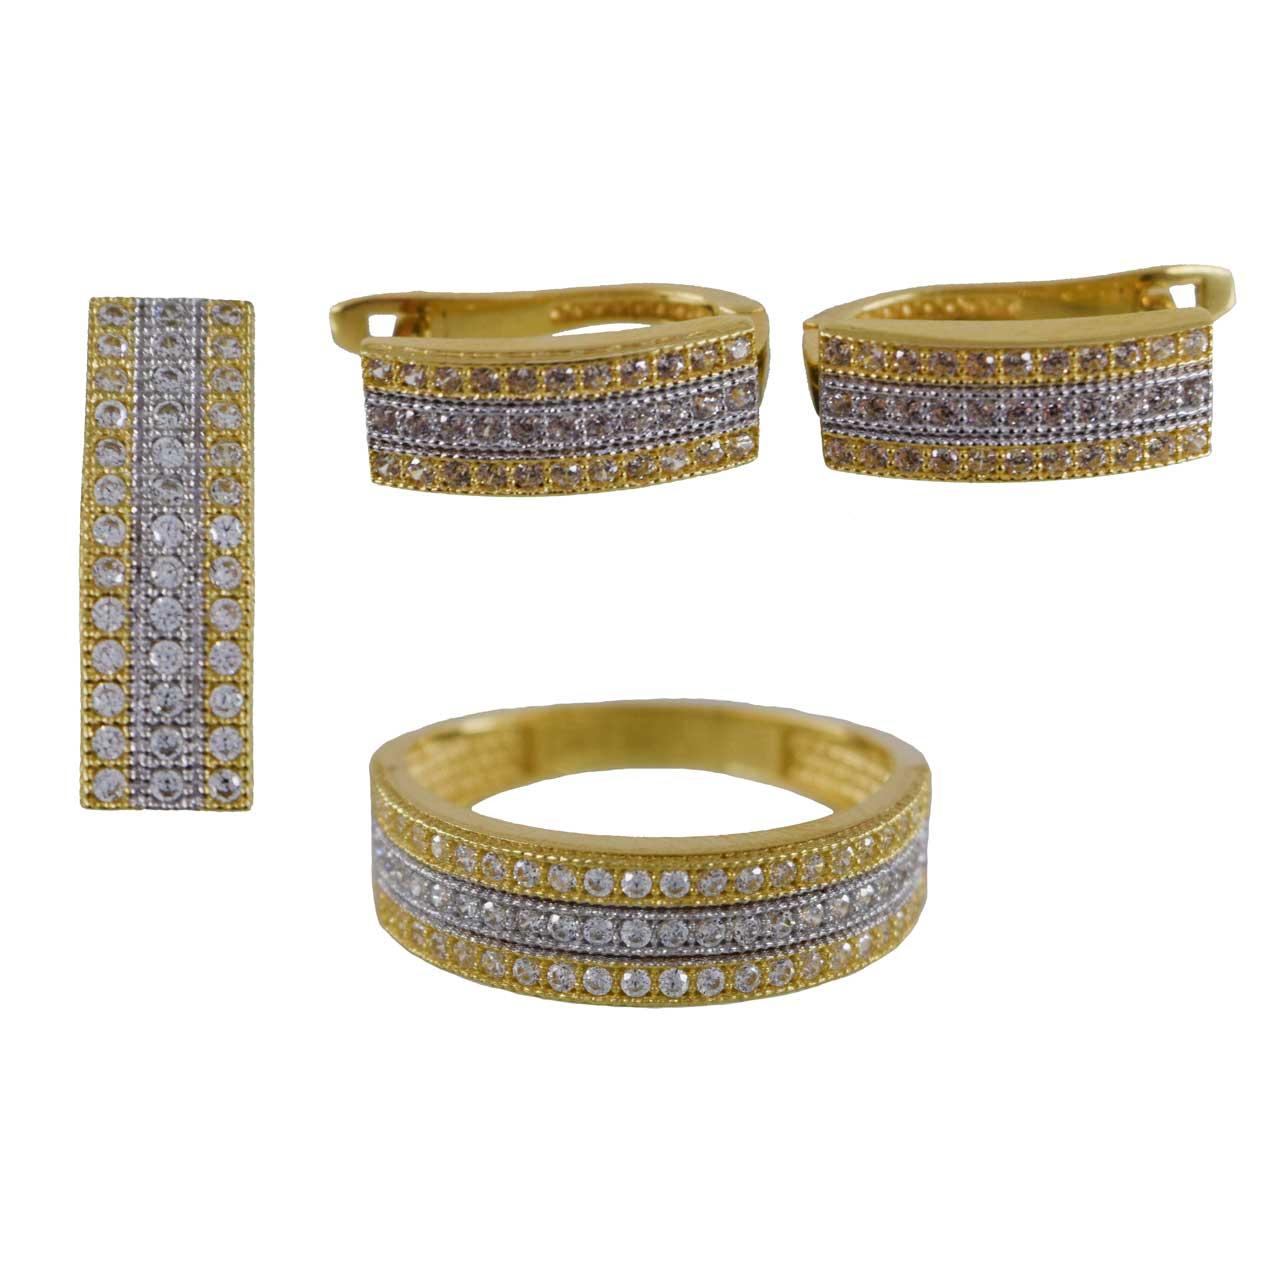 قیمت نیم ست طلا 18 عیار کانیار گالری مدل N542